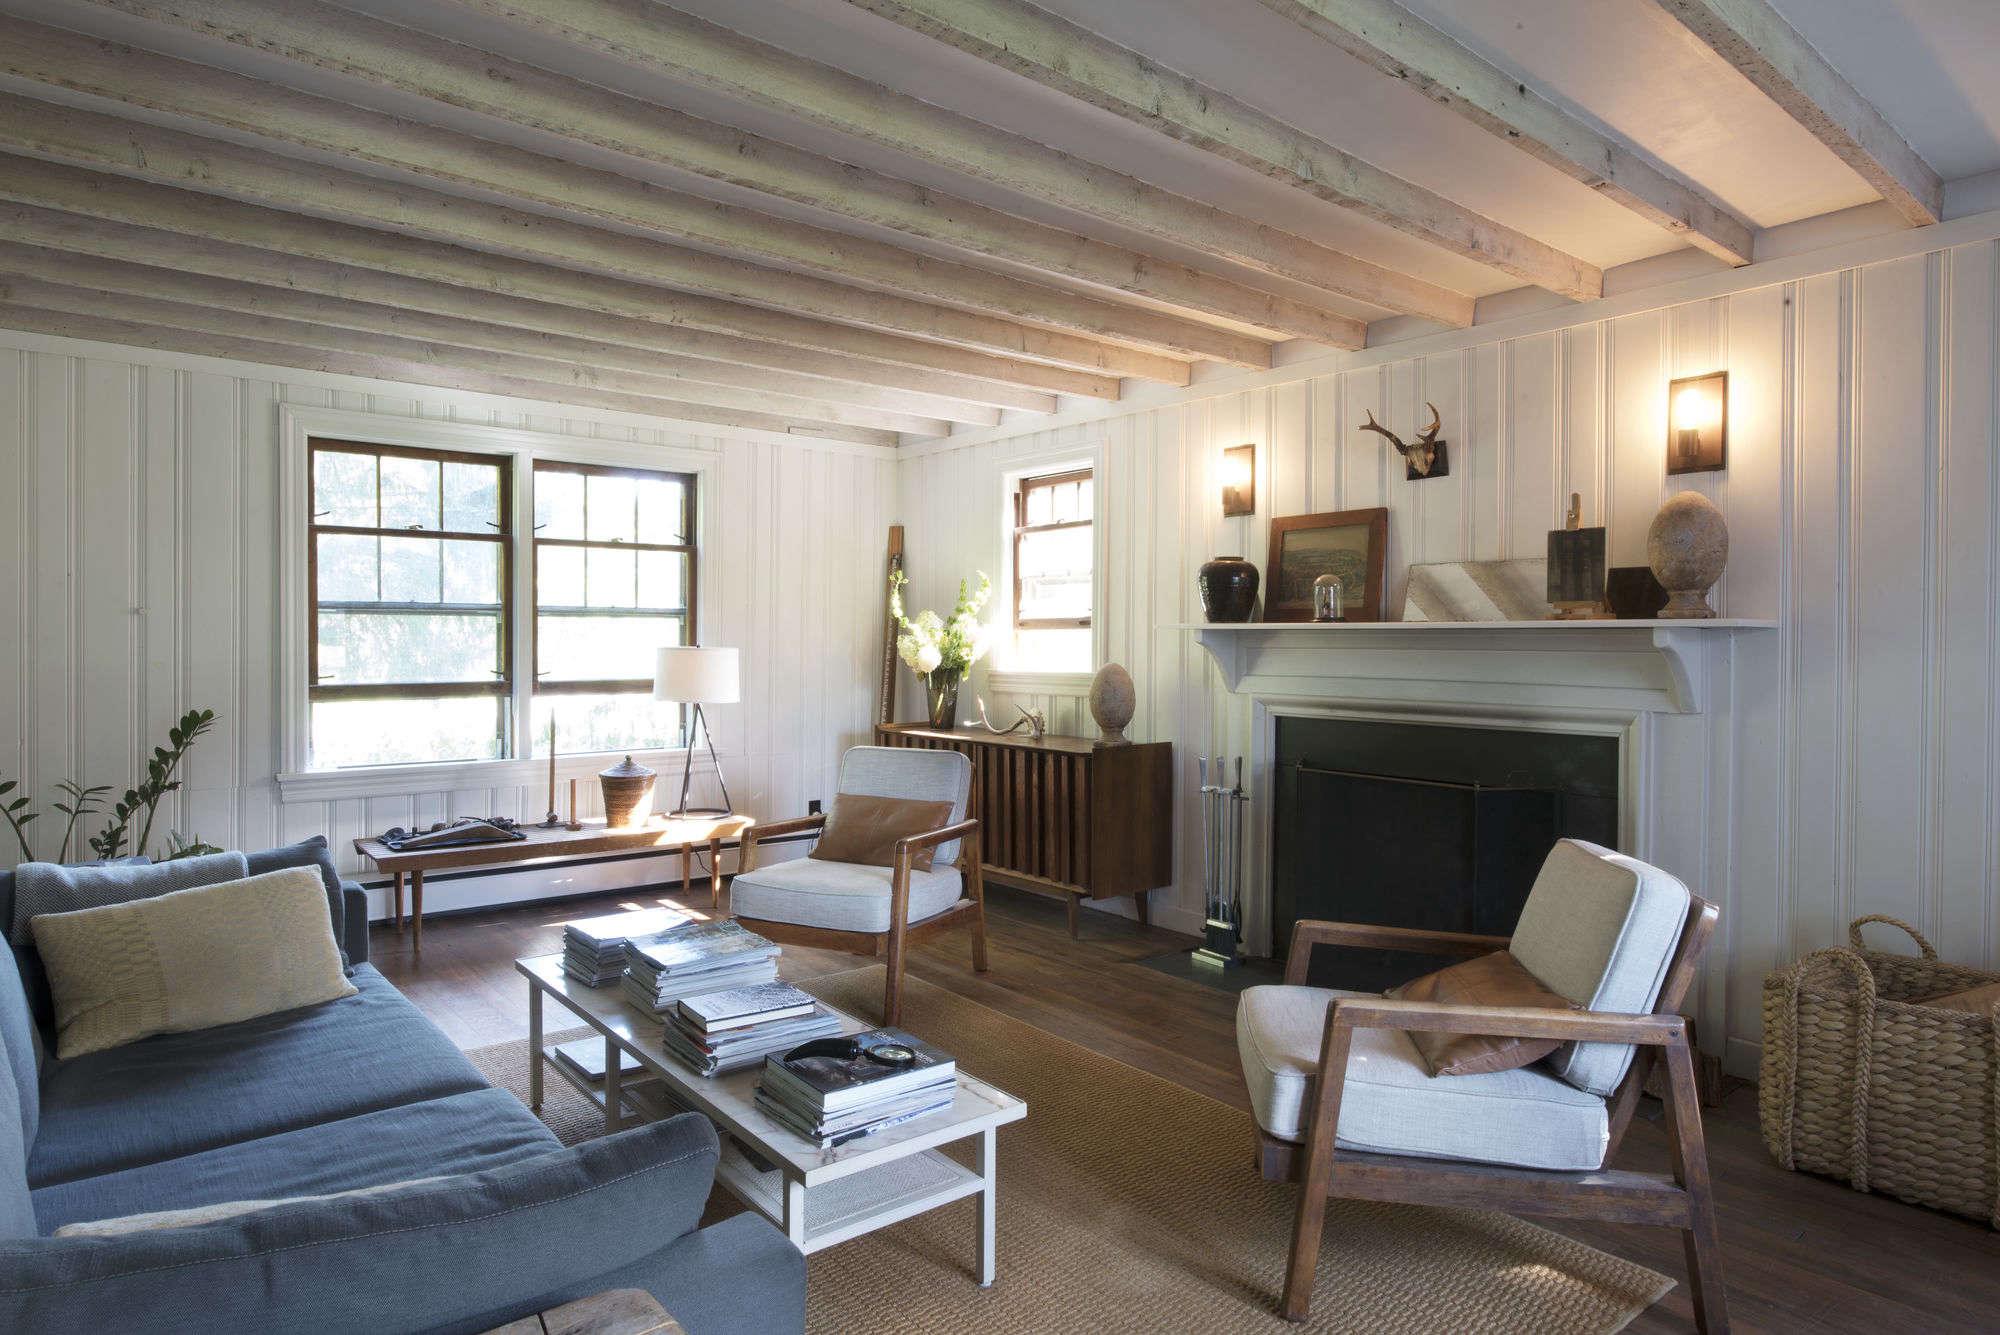 roberto-sosa-farmhouse-living-room-mylene-pionilla External House Paint Design on exterior house paints, historical house paints, common house paints, outer house paints,